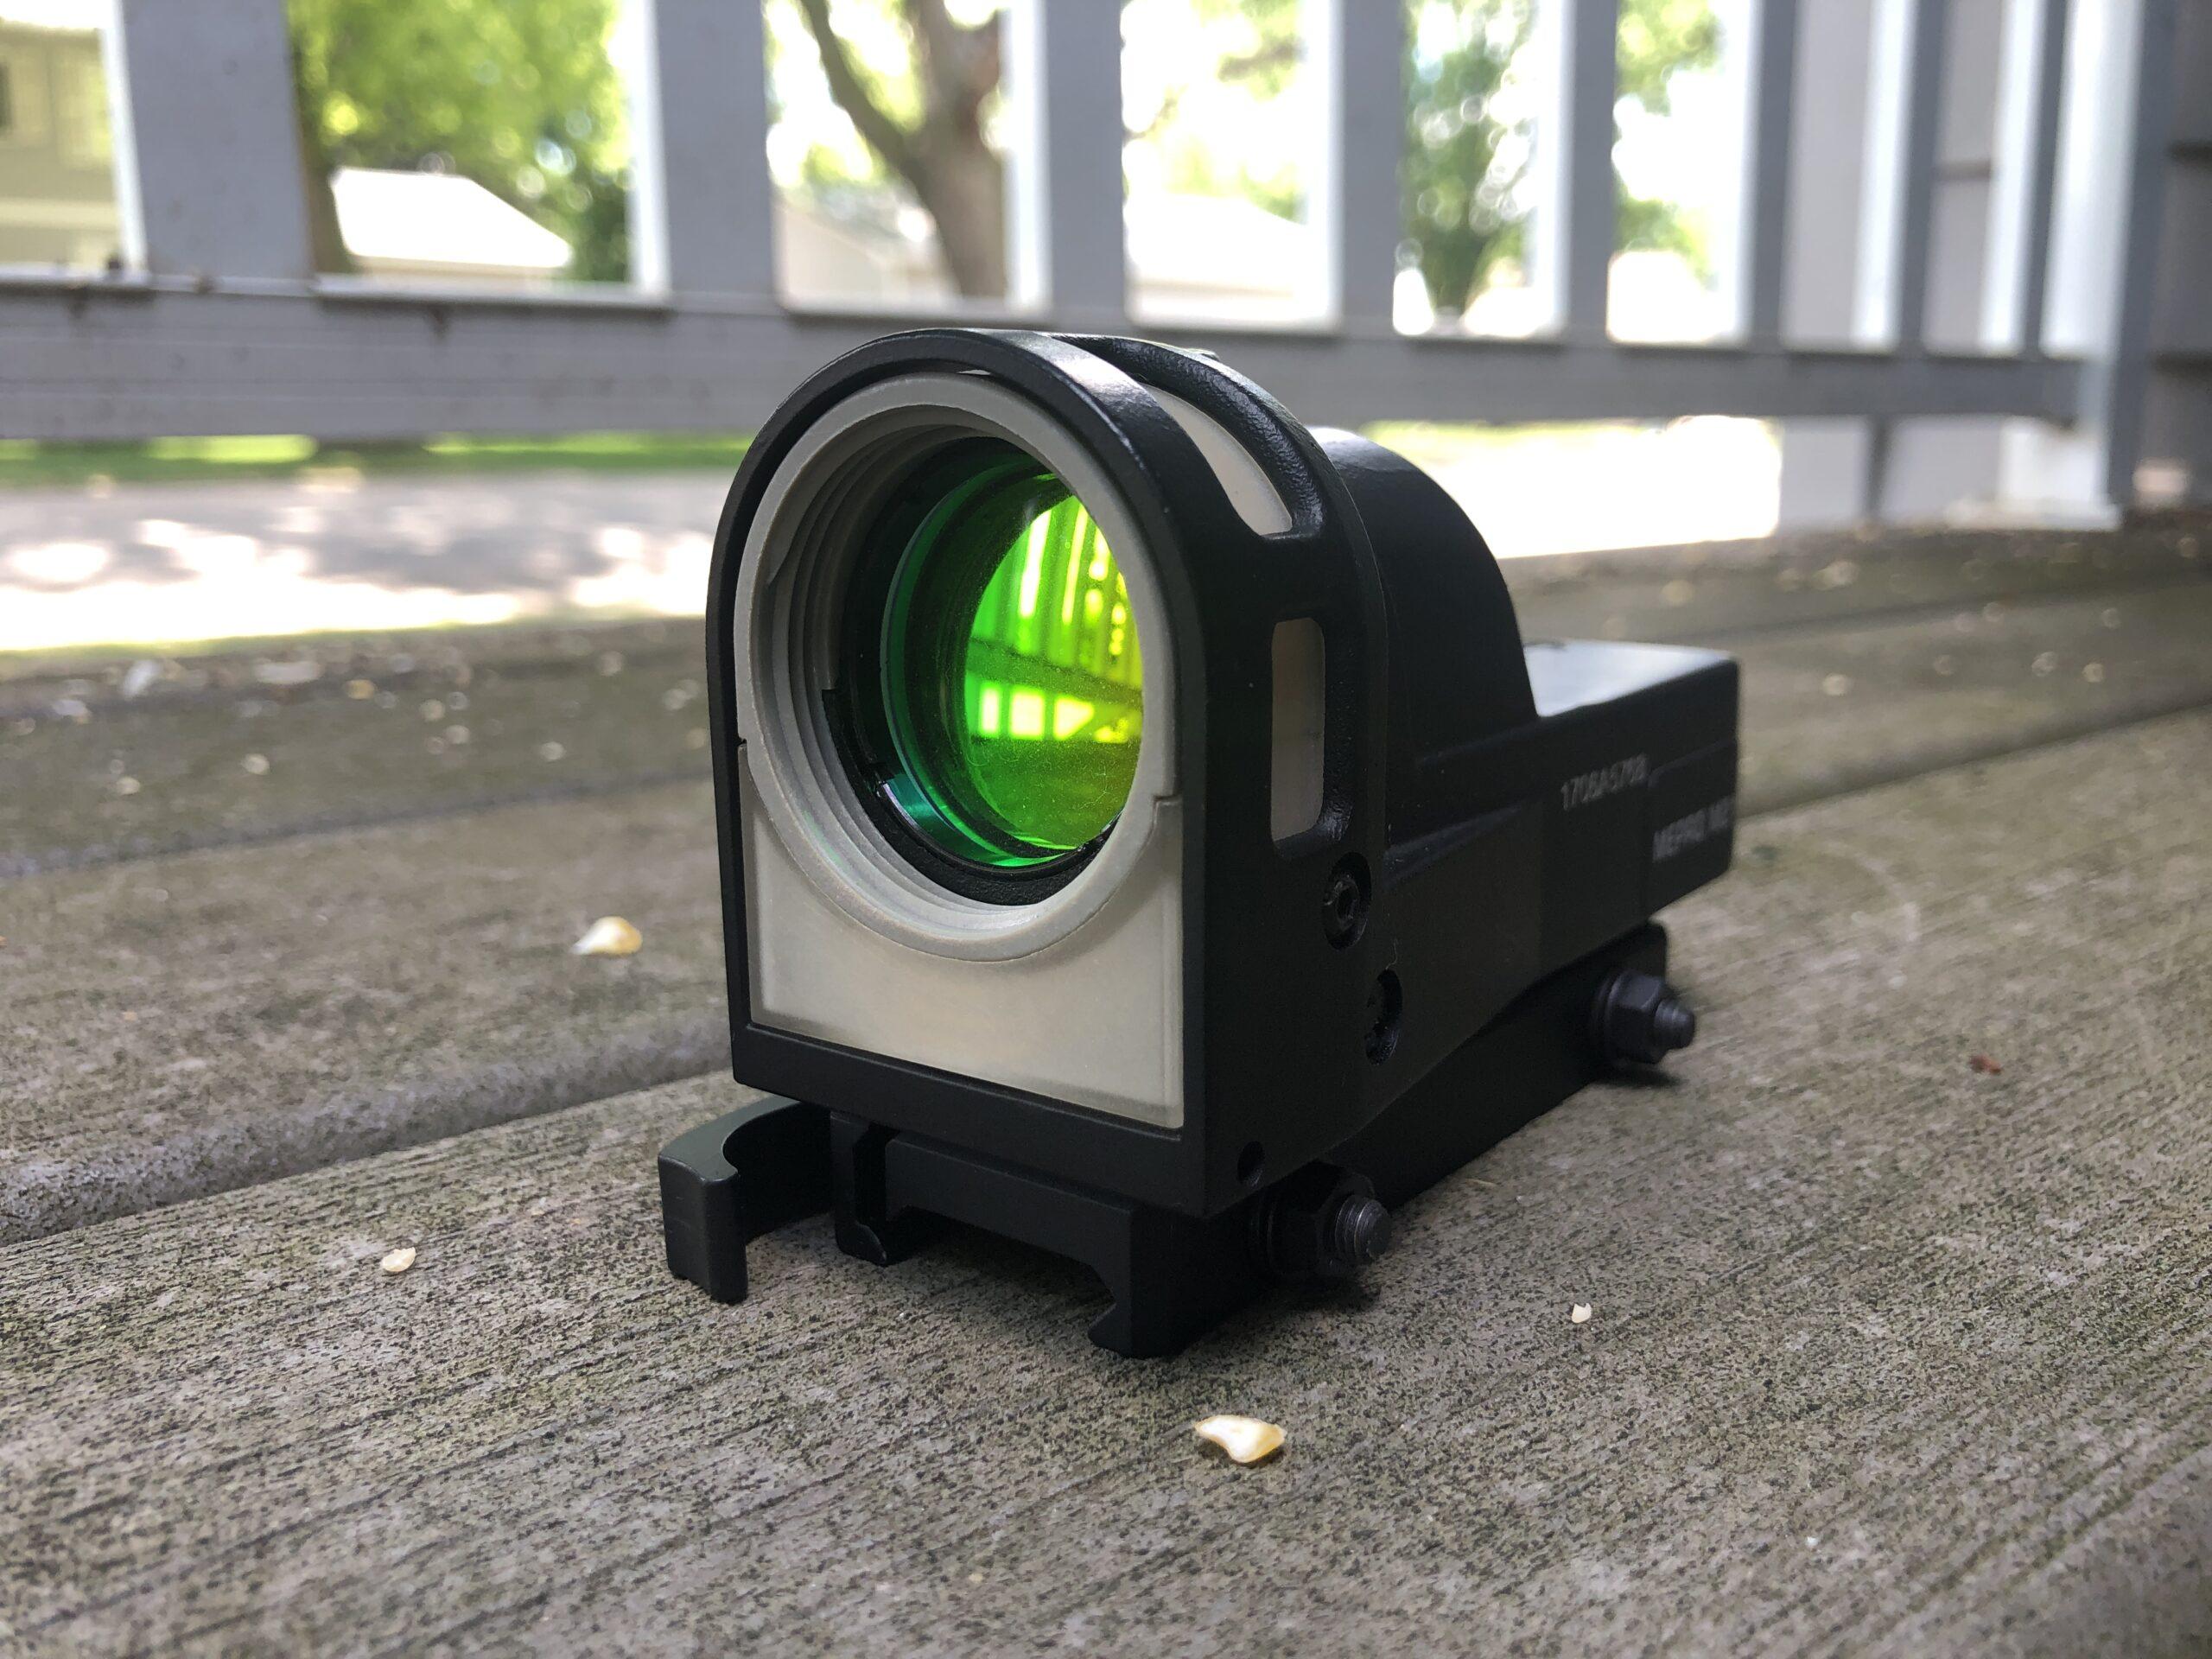 Meprolight M21 amazon